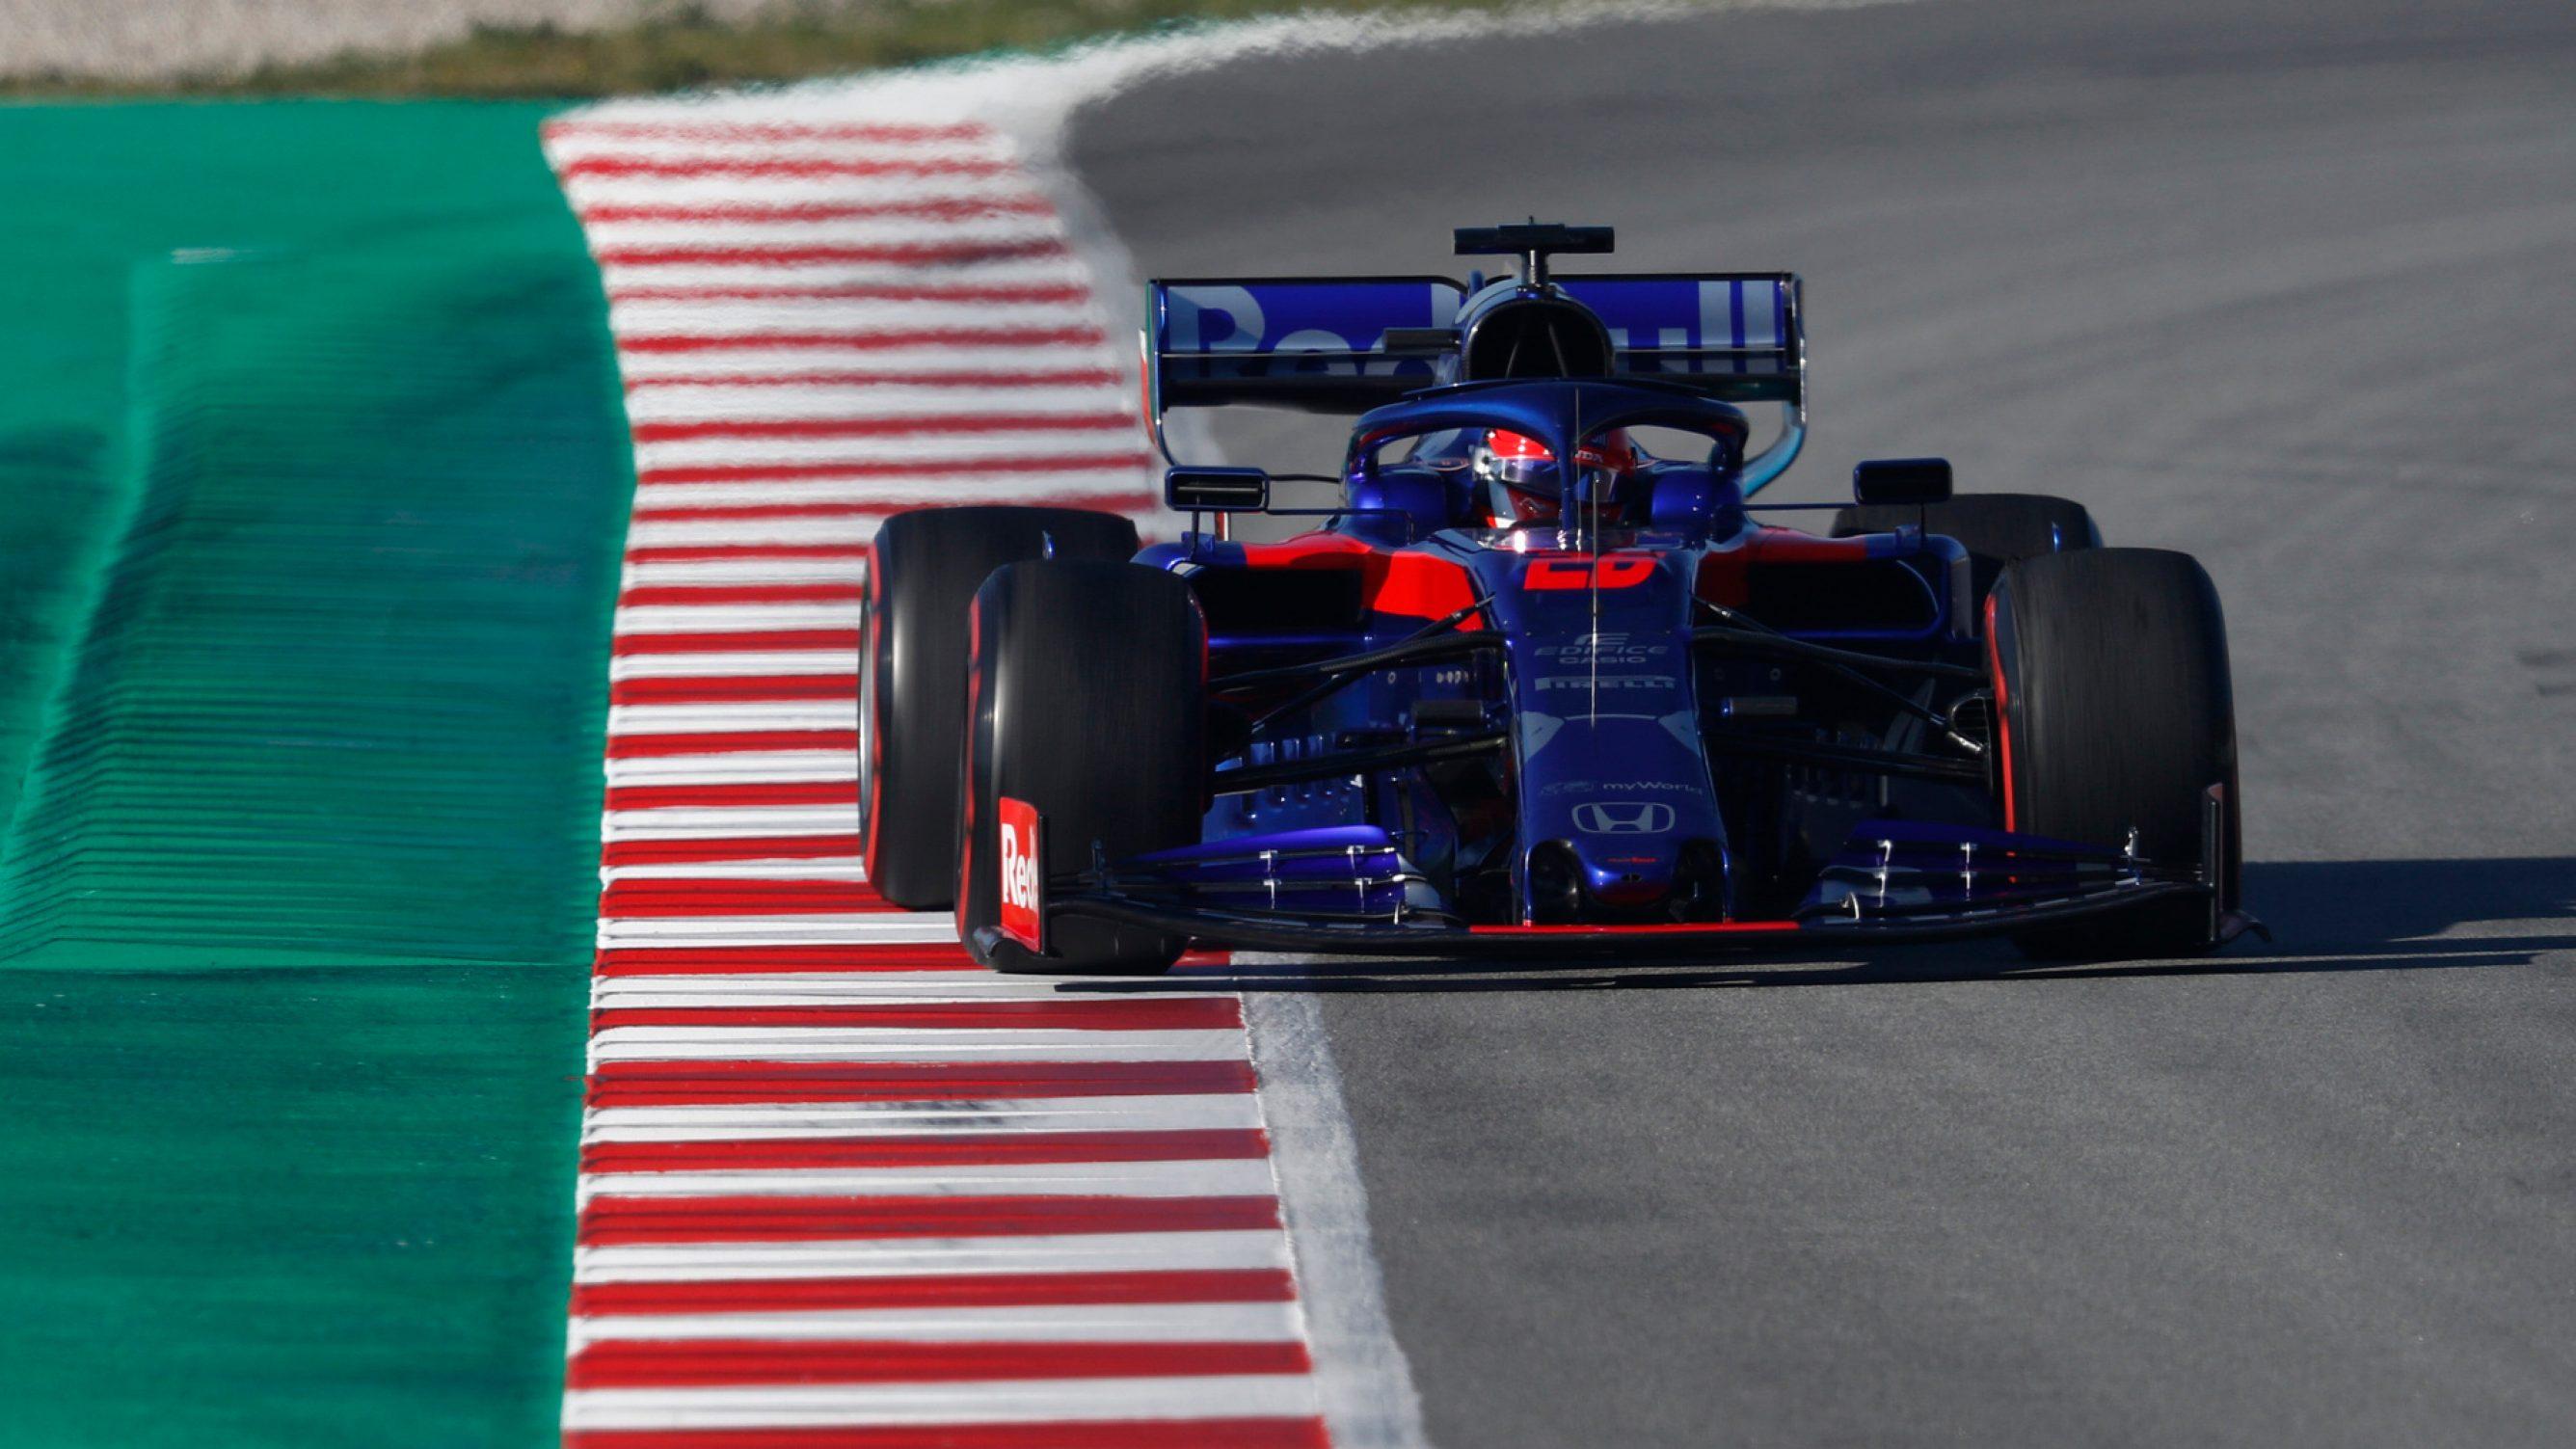 2019_F1_testing_2_day_2_0008